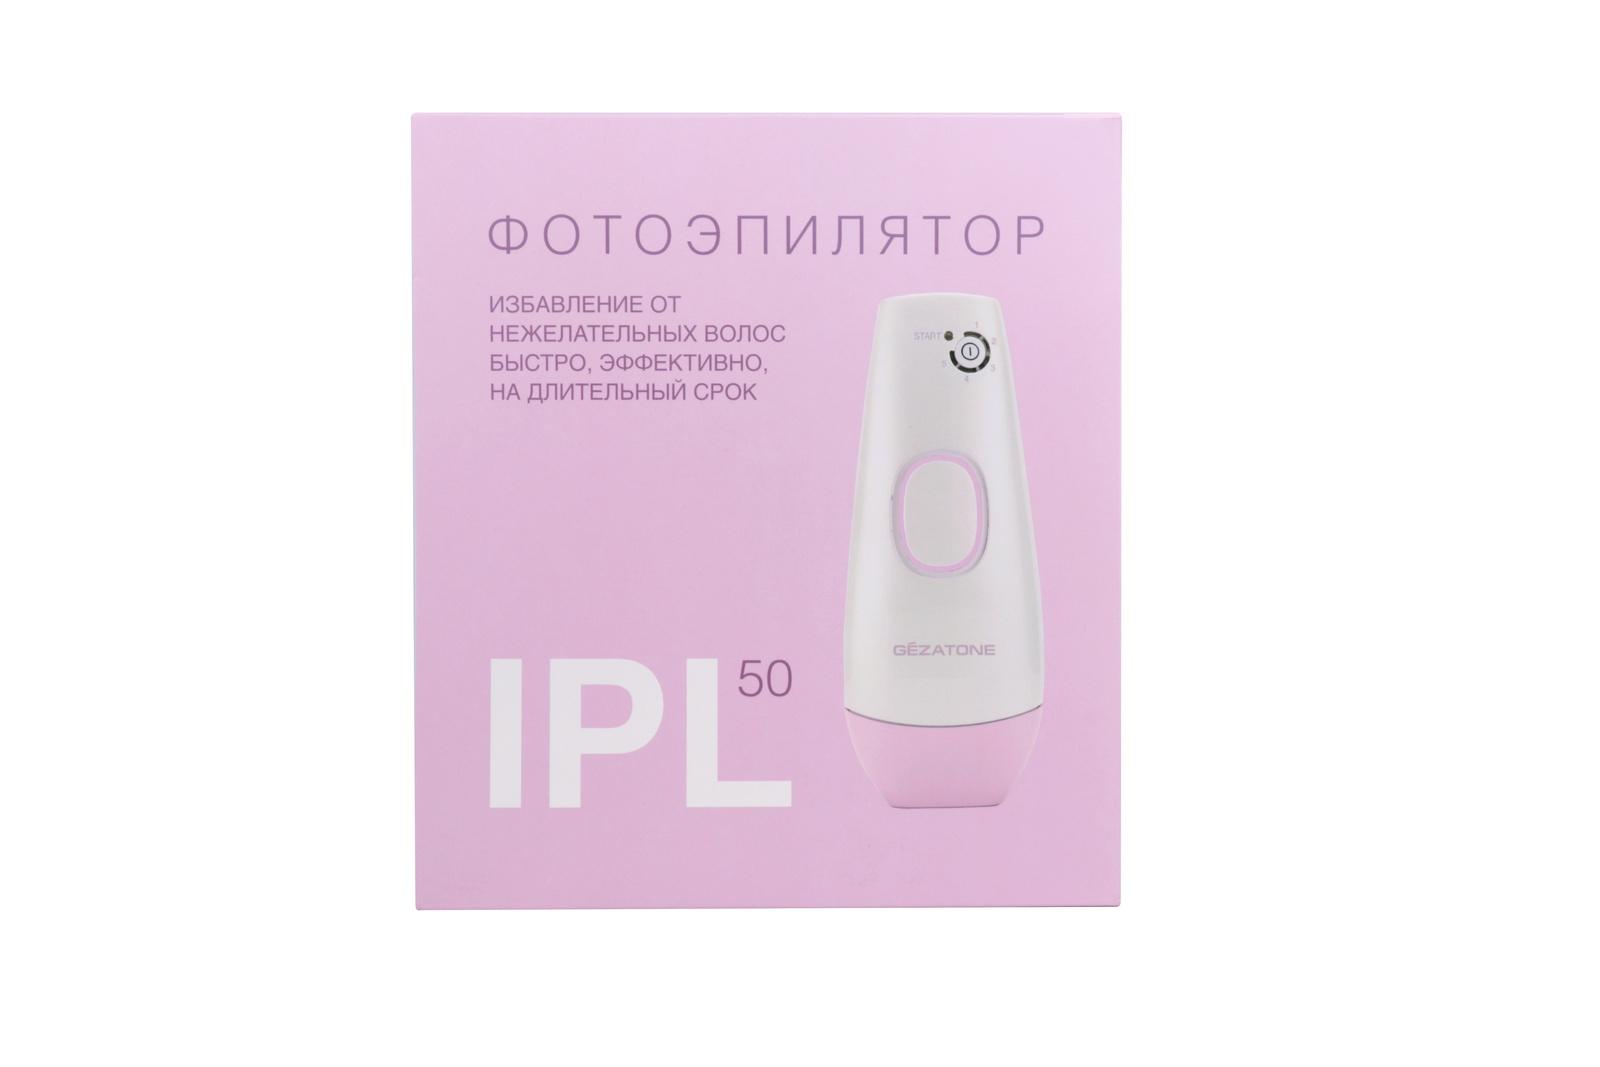 1036979673 - Фотоэпилятор IPL 50 Gezatone